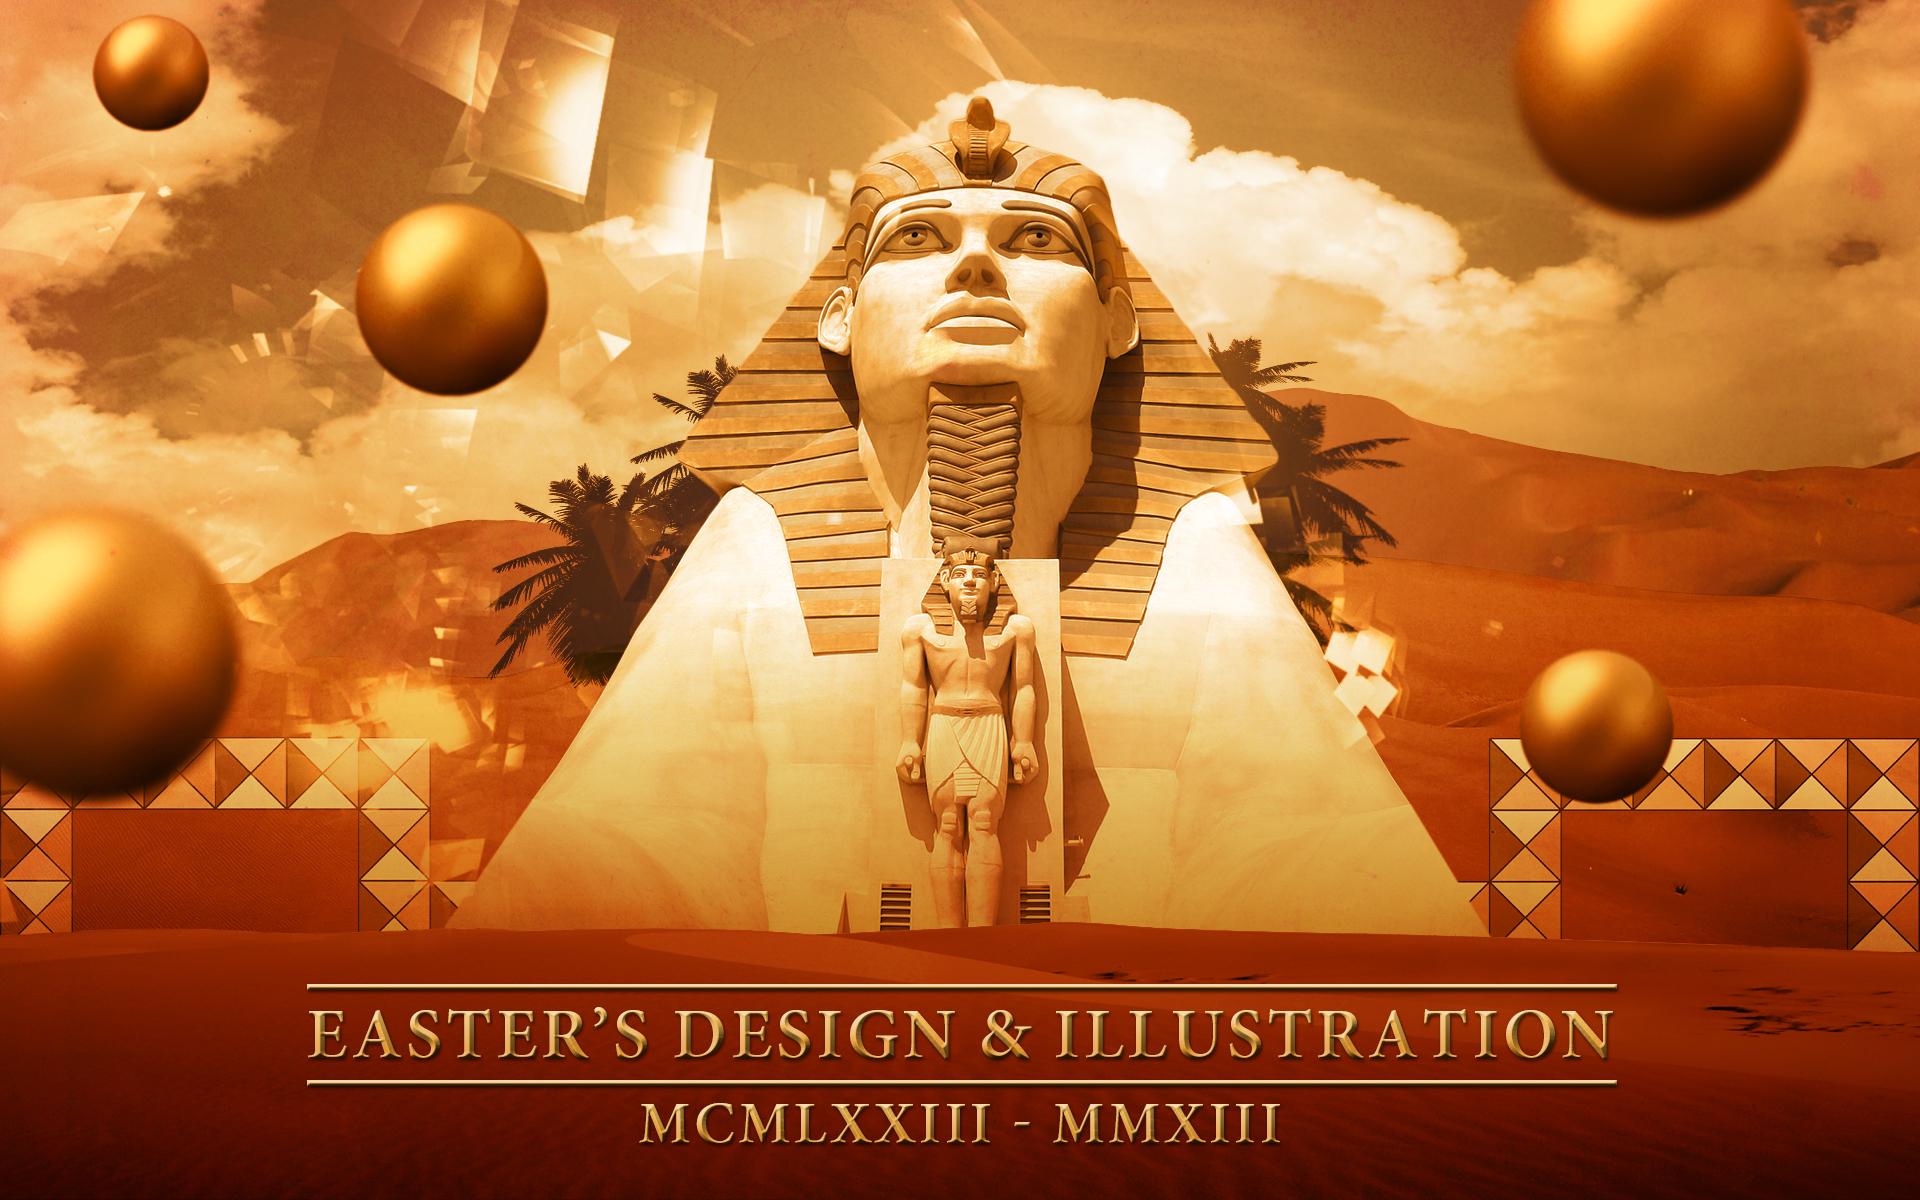 3d Wallpaper For Desktop Icon Space And Fantasy Effect S Easter S Design Amp Illustration